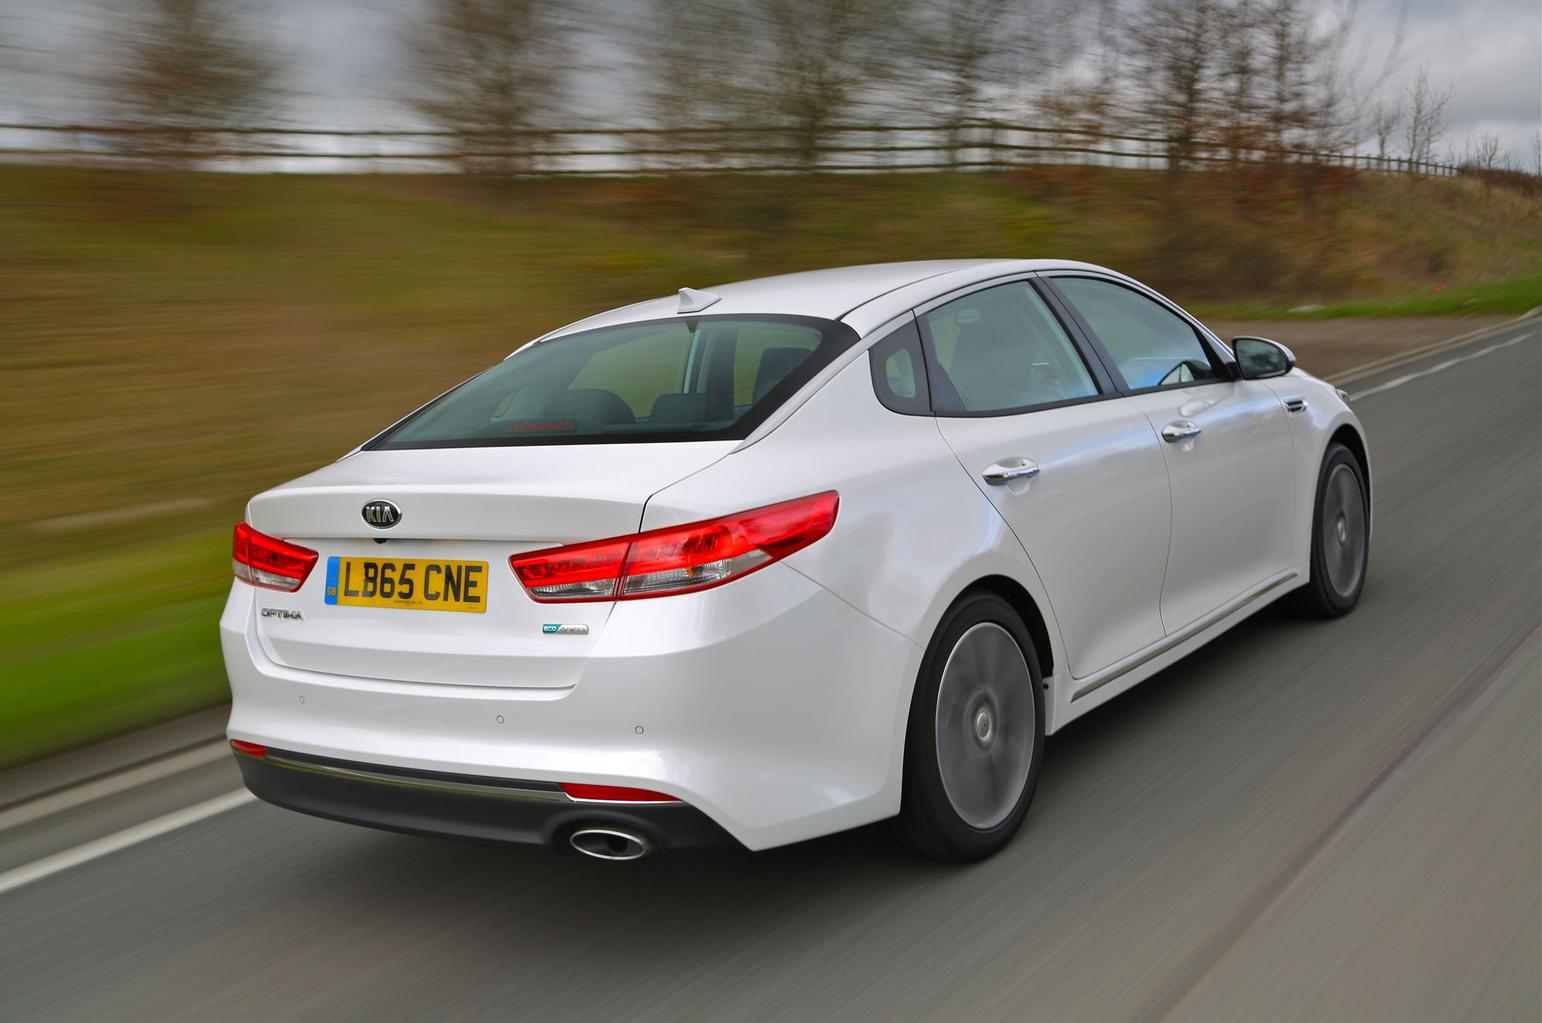 New car deal of the Day: Kia Optima